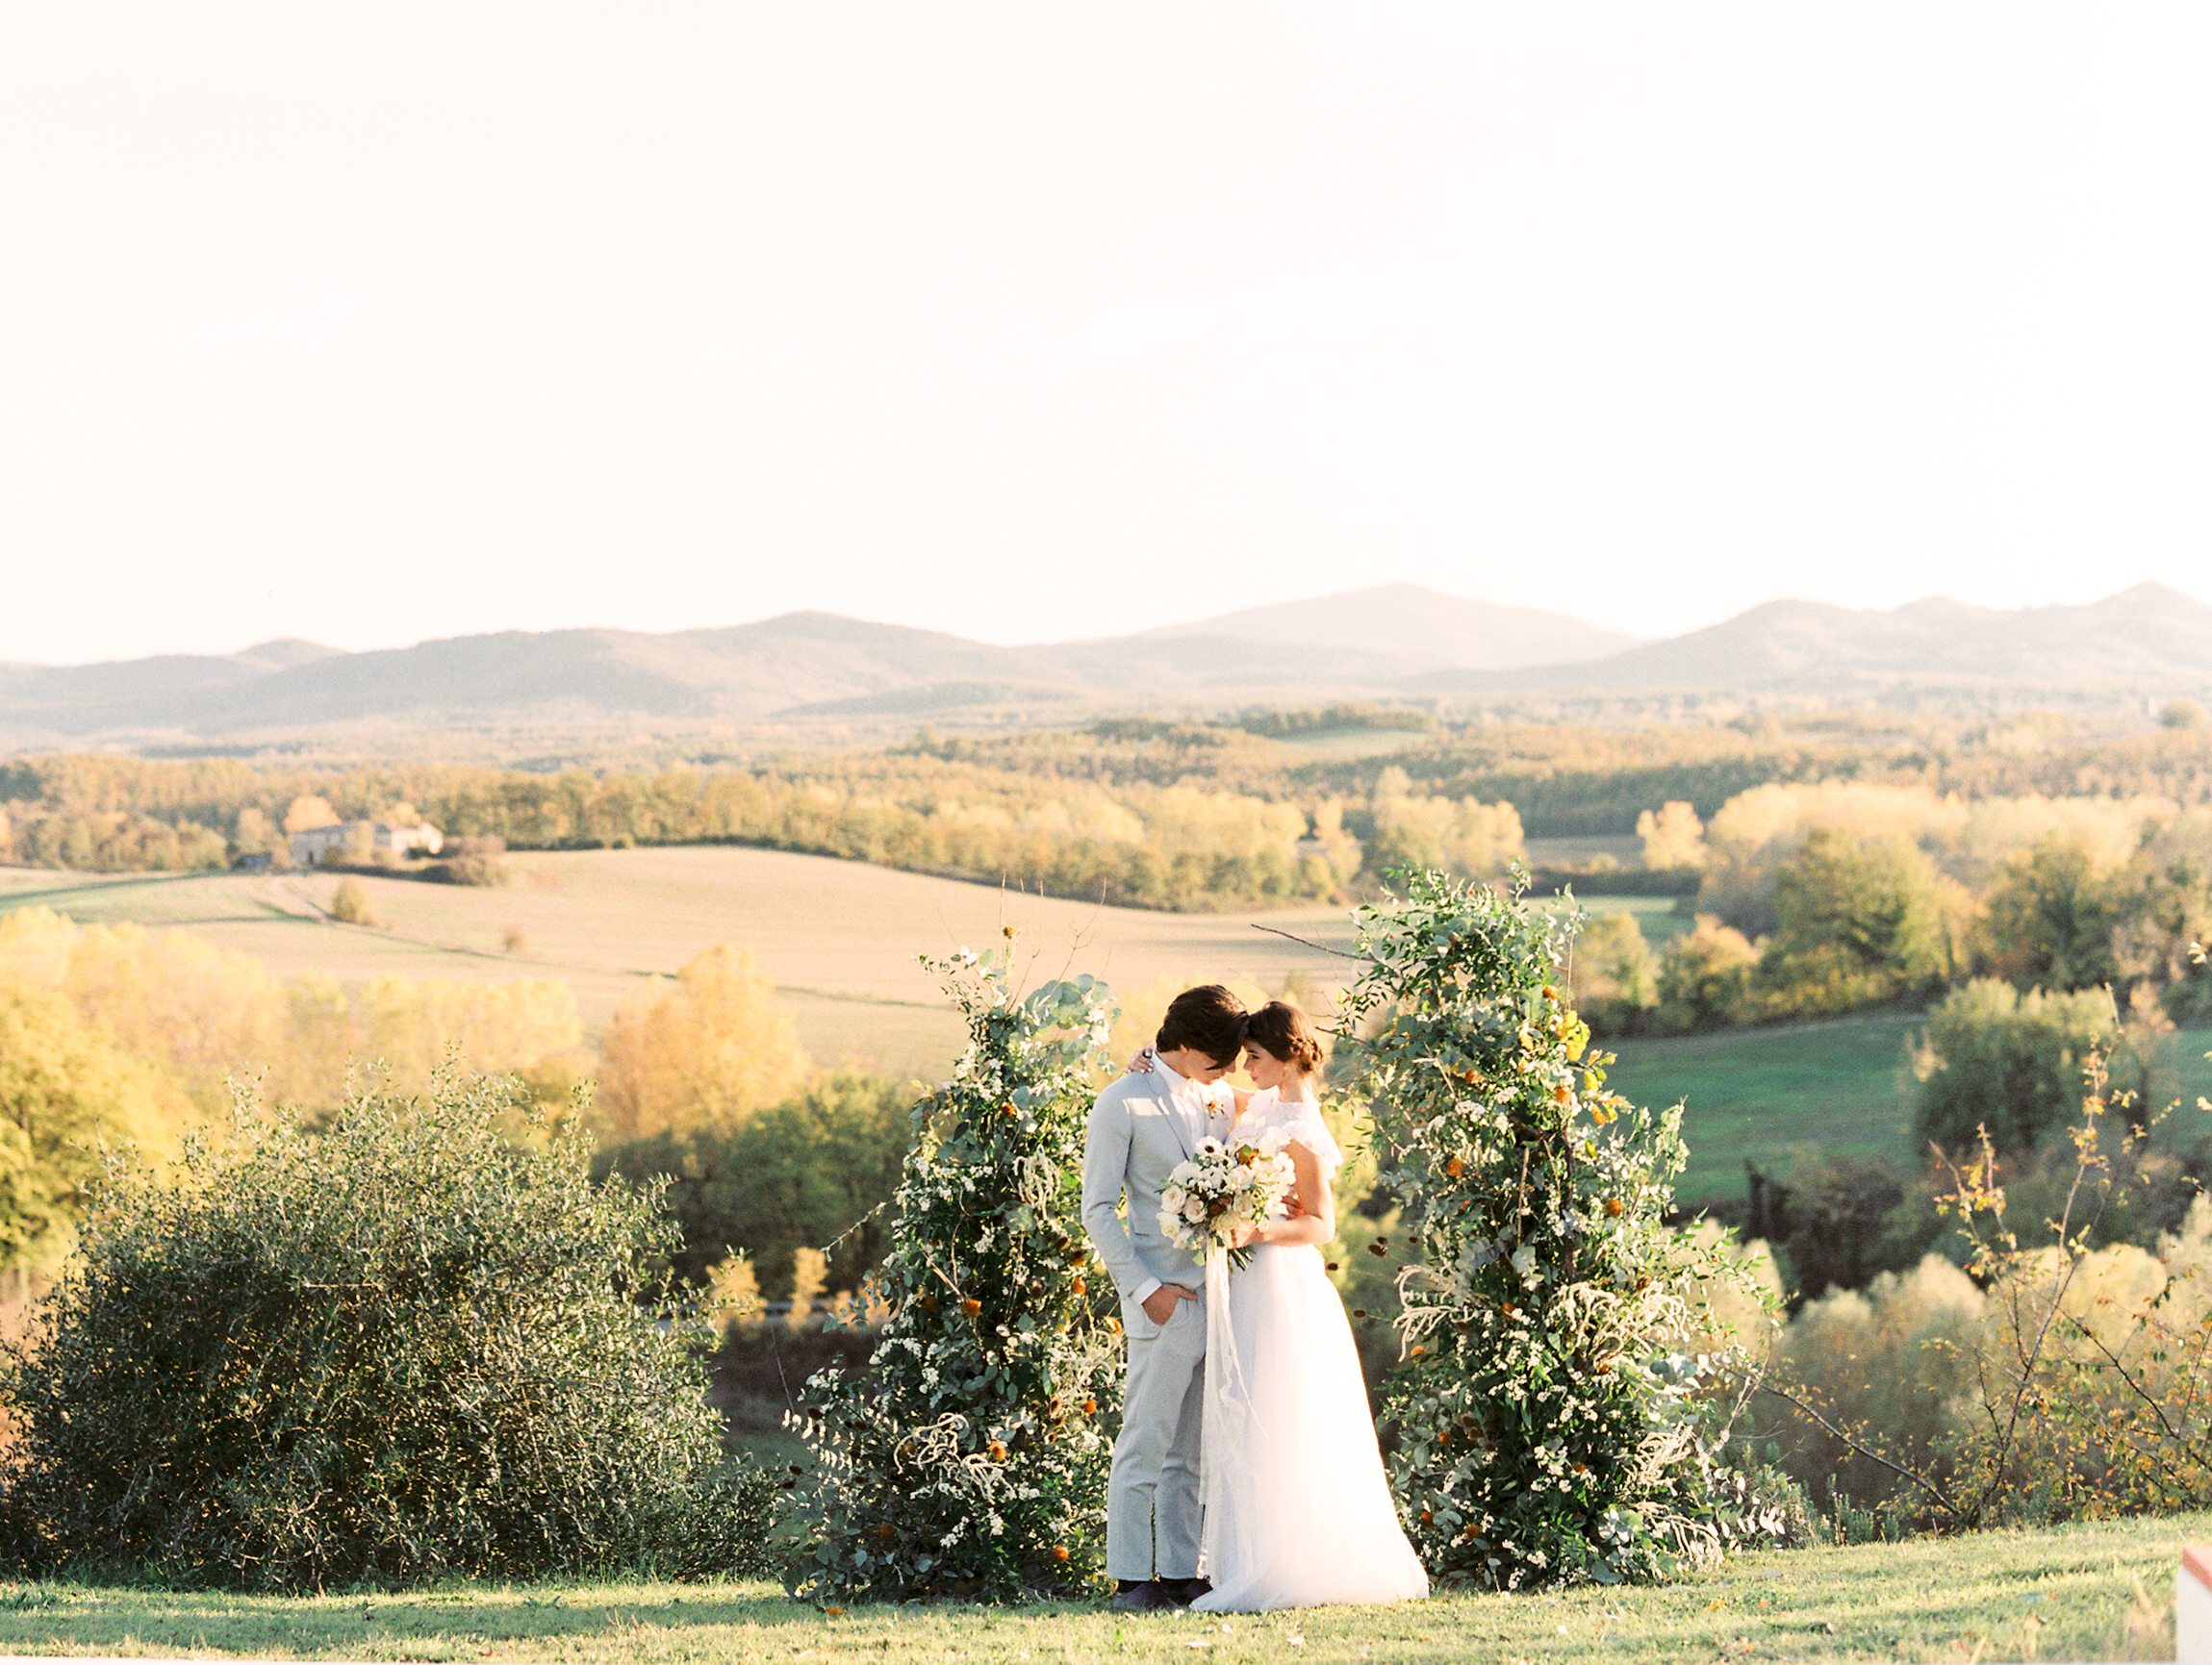 Romantic-wedding-in-Tuscany-italy.jpg